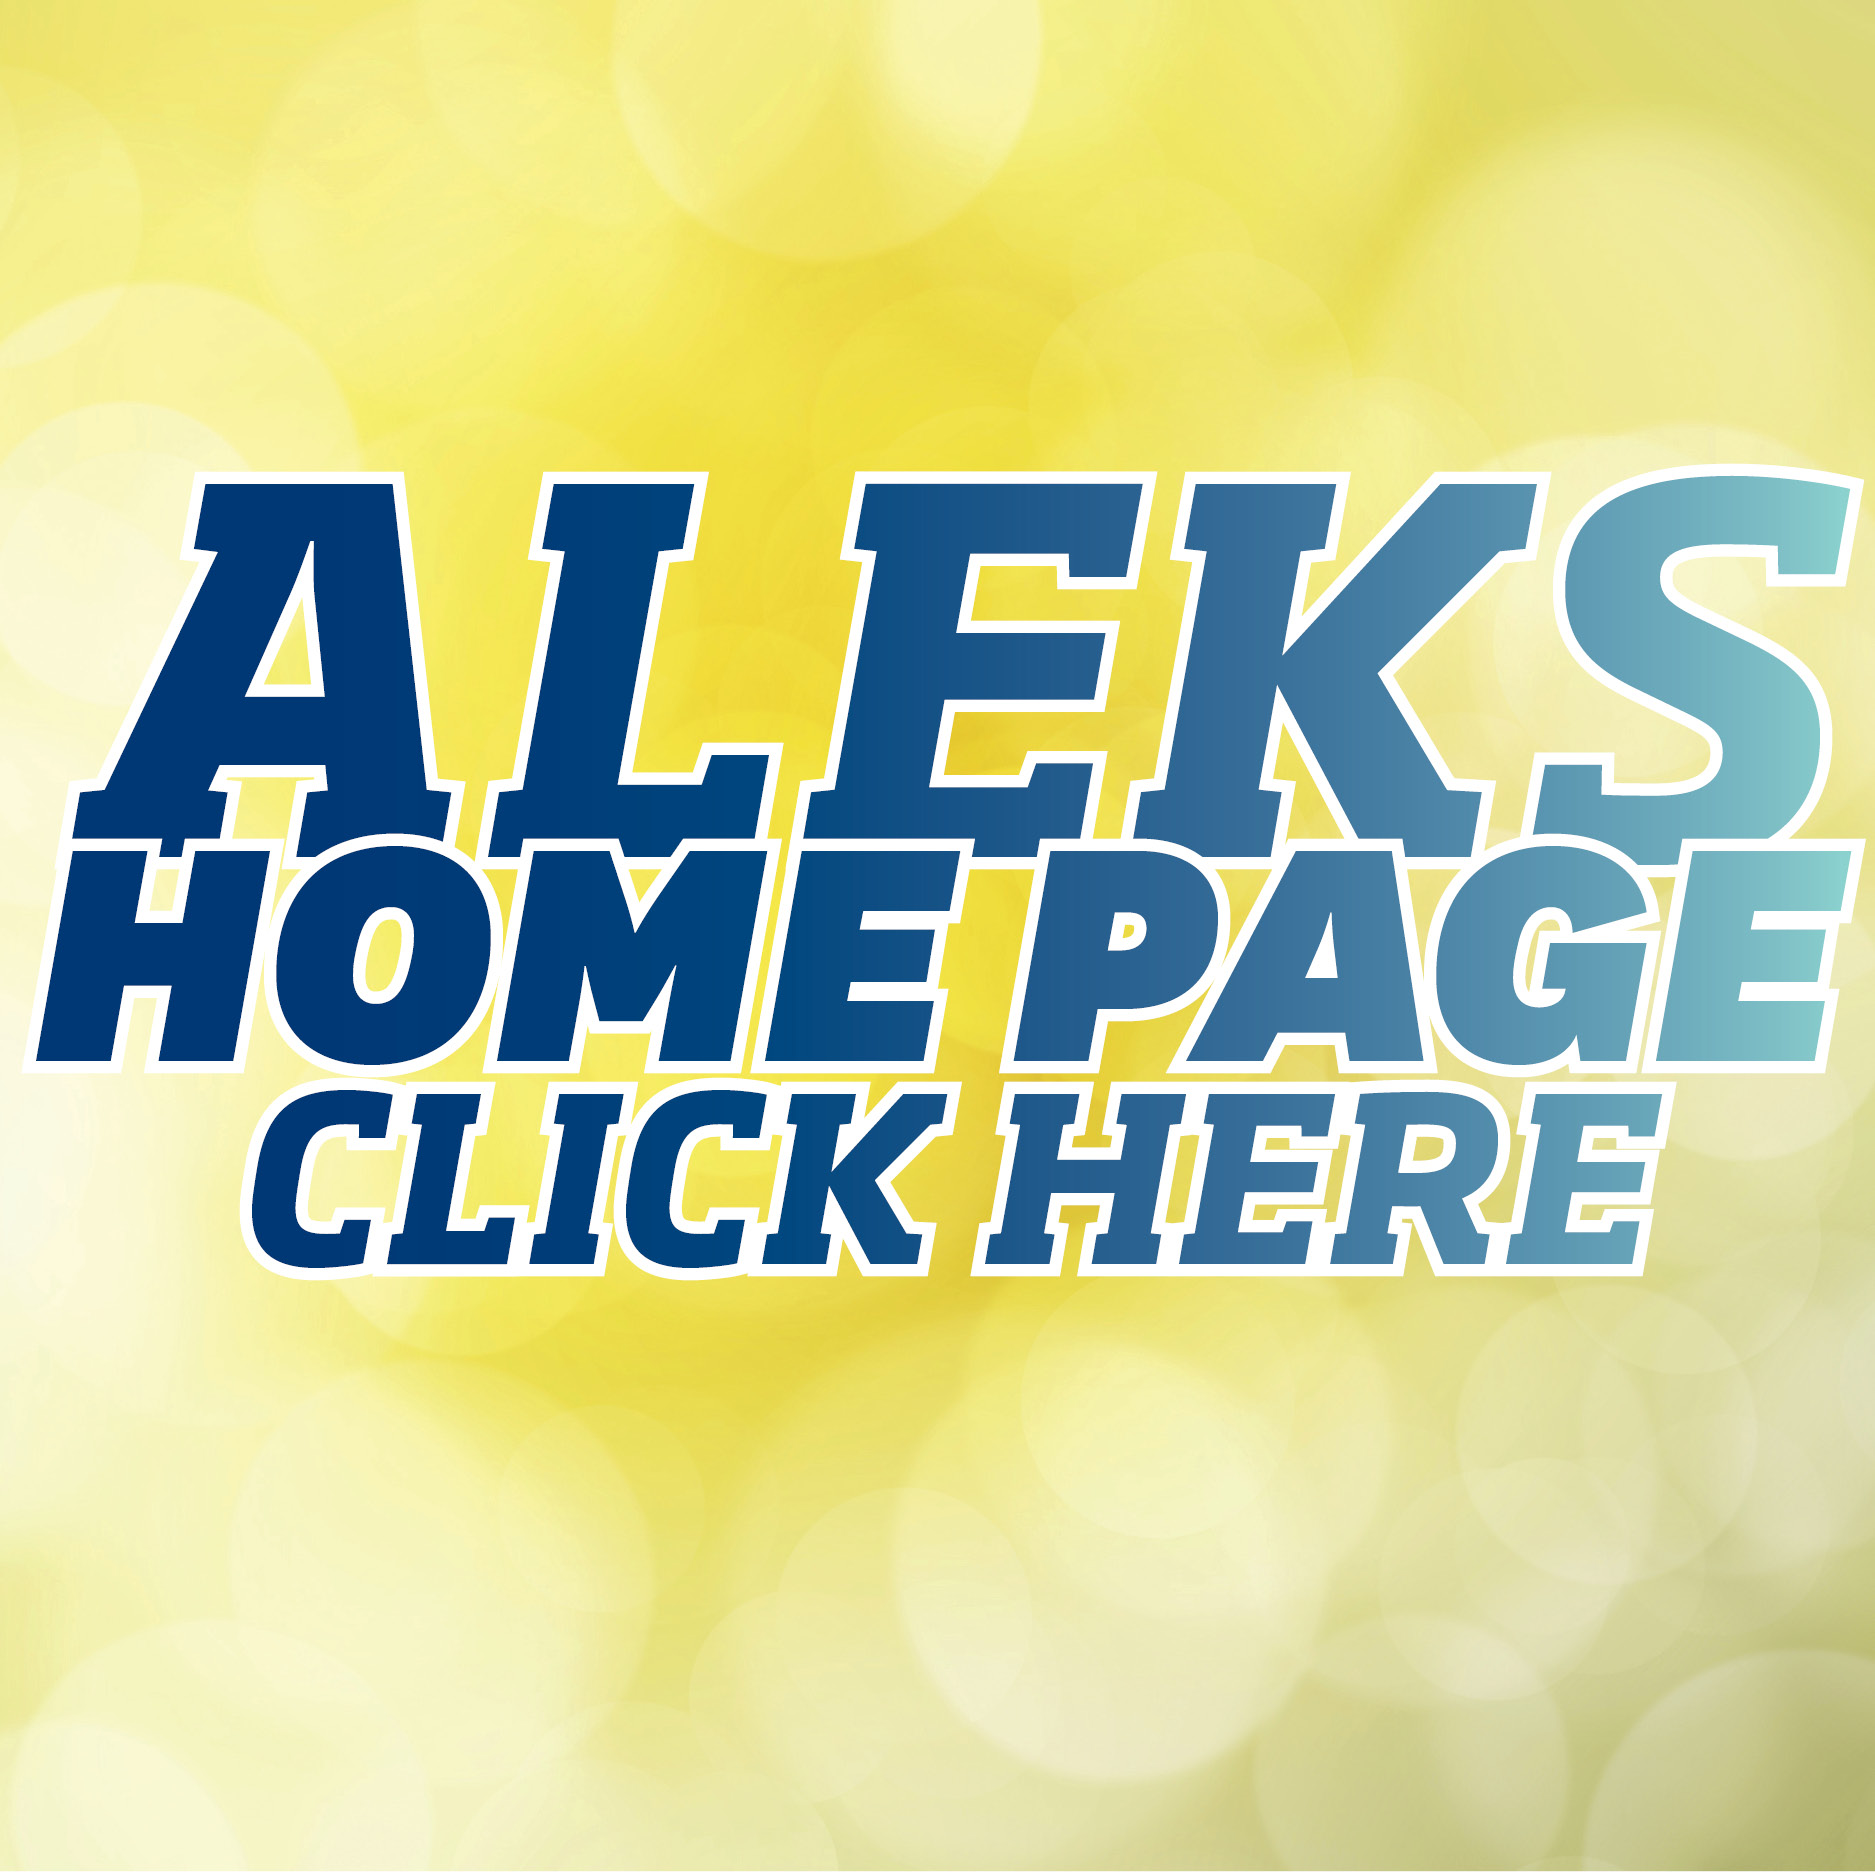 Visit the ALEKS home page